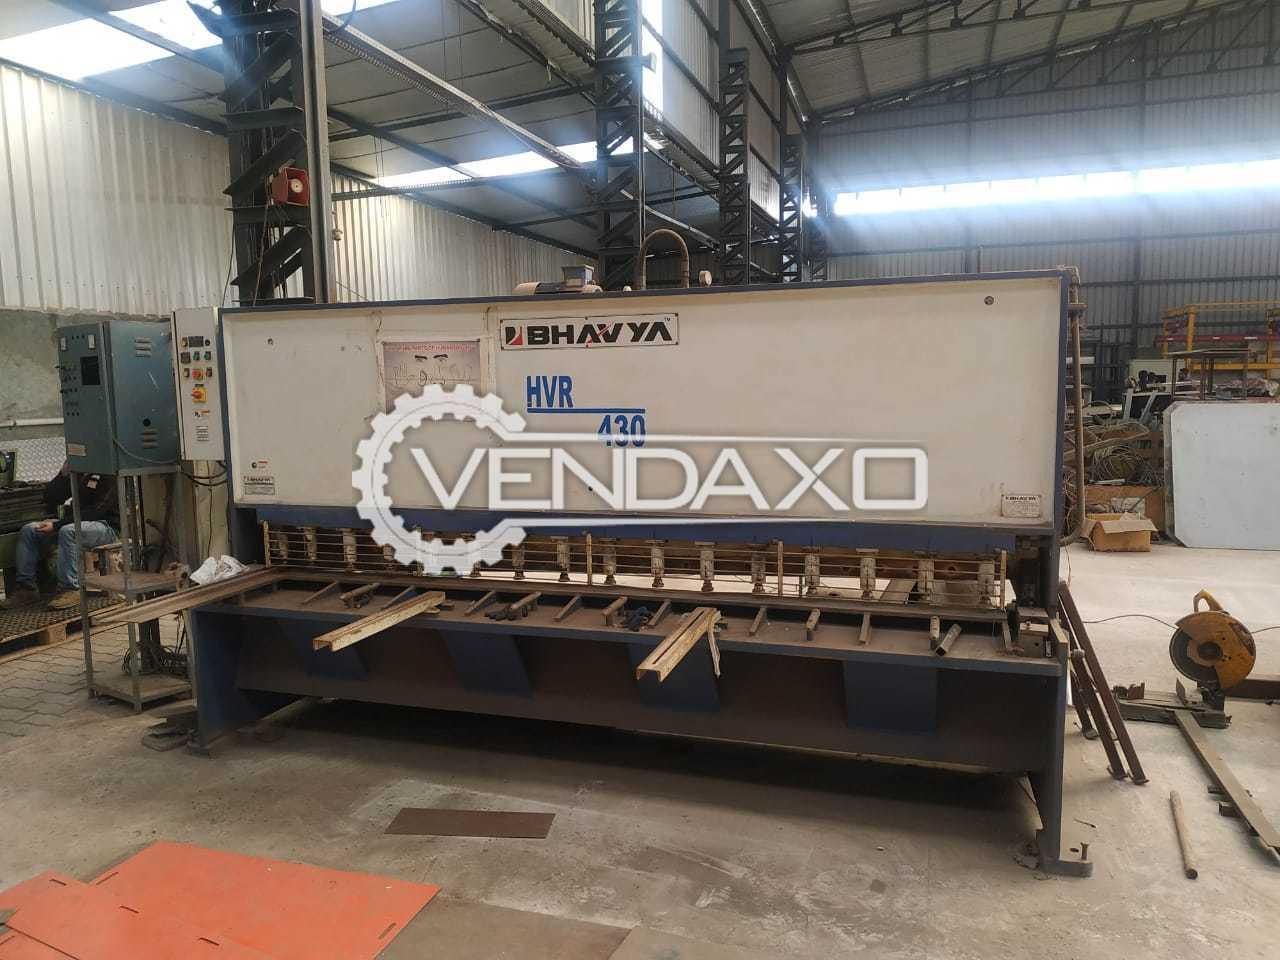 Bhavya HVR 430 Hydraulic Shearing Machine - 3000 x 6 mm